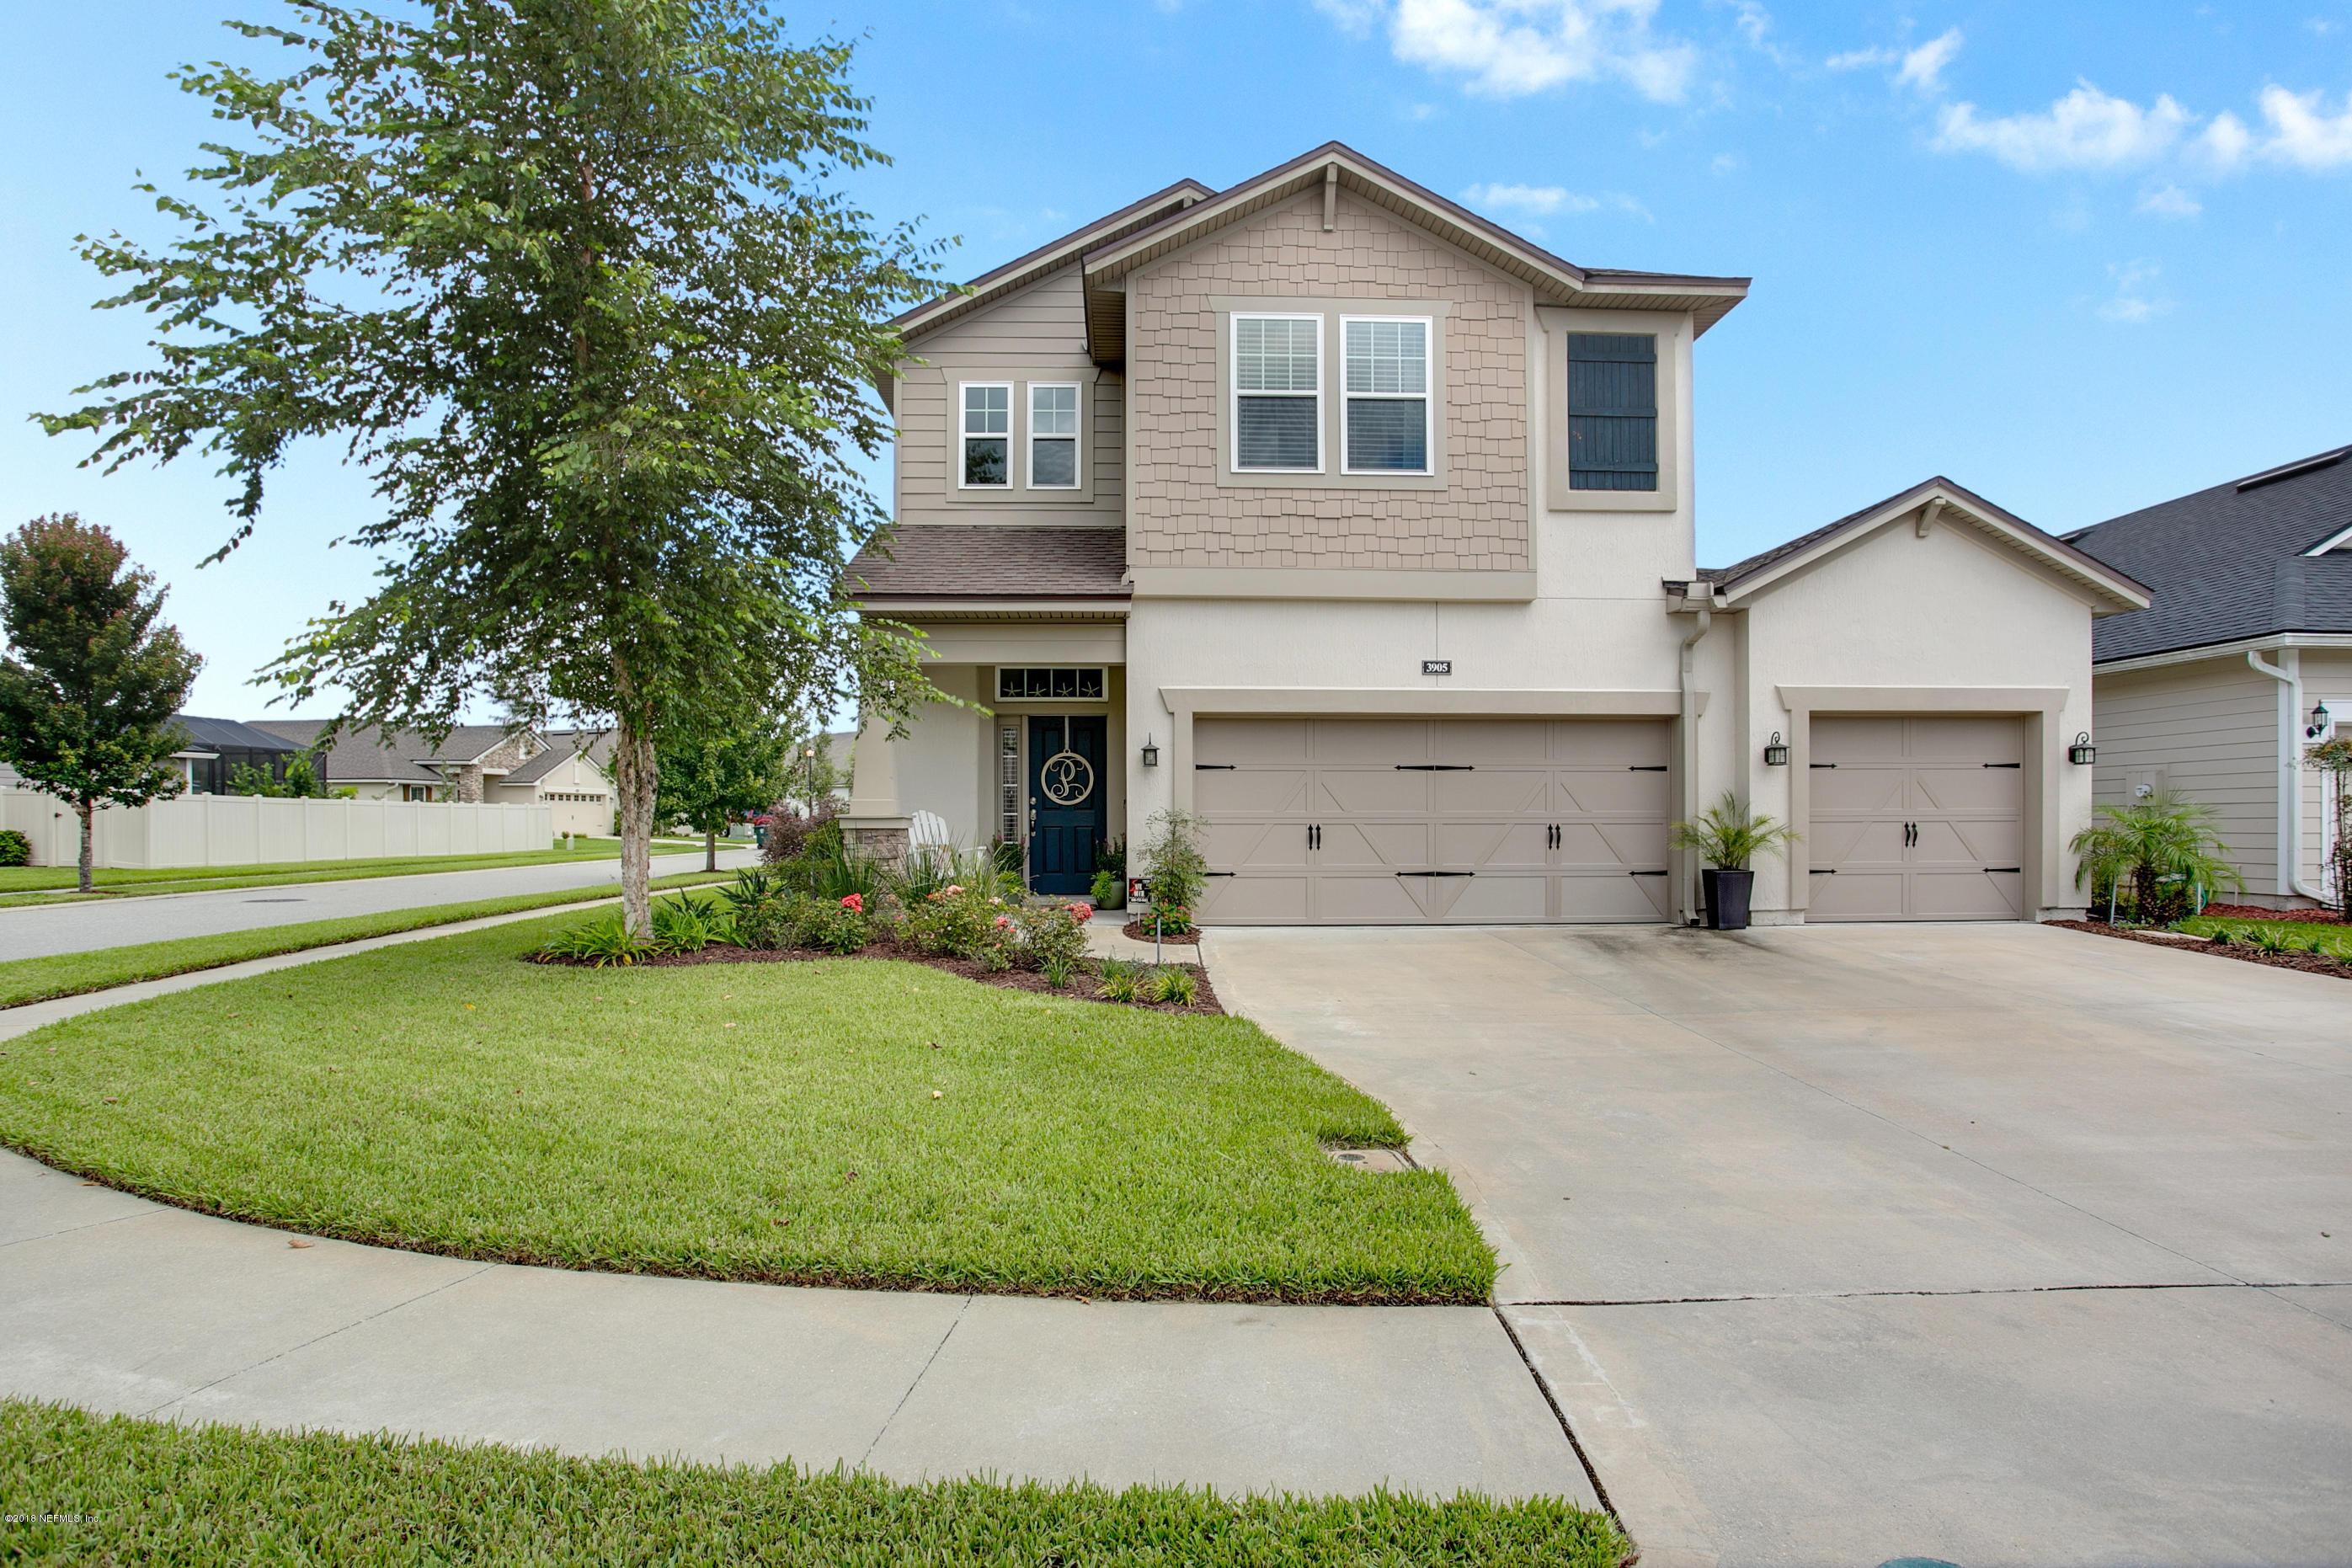 3905 BURNT PINE, JACKSONVILLE, FLORIDA 32224, 4 Bedrooms Bedrooms, ,3 BathroomsBathrooms,Residential - single family,For sale,BURNT PINE,957428